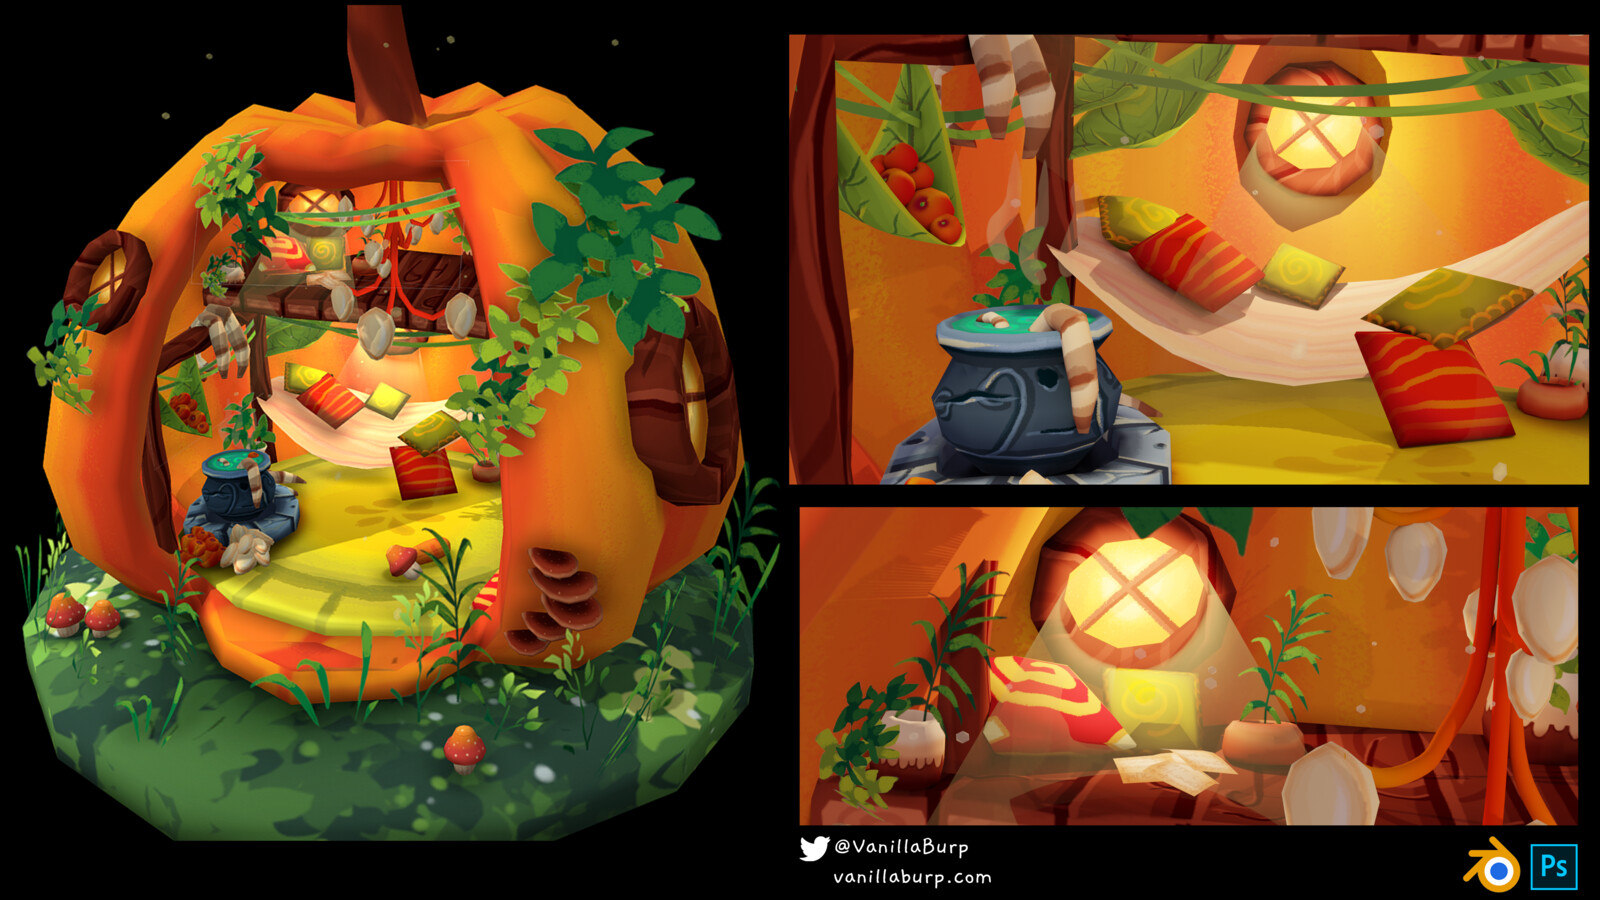 The Woodland Pumpkin Encounter